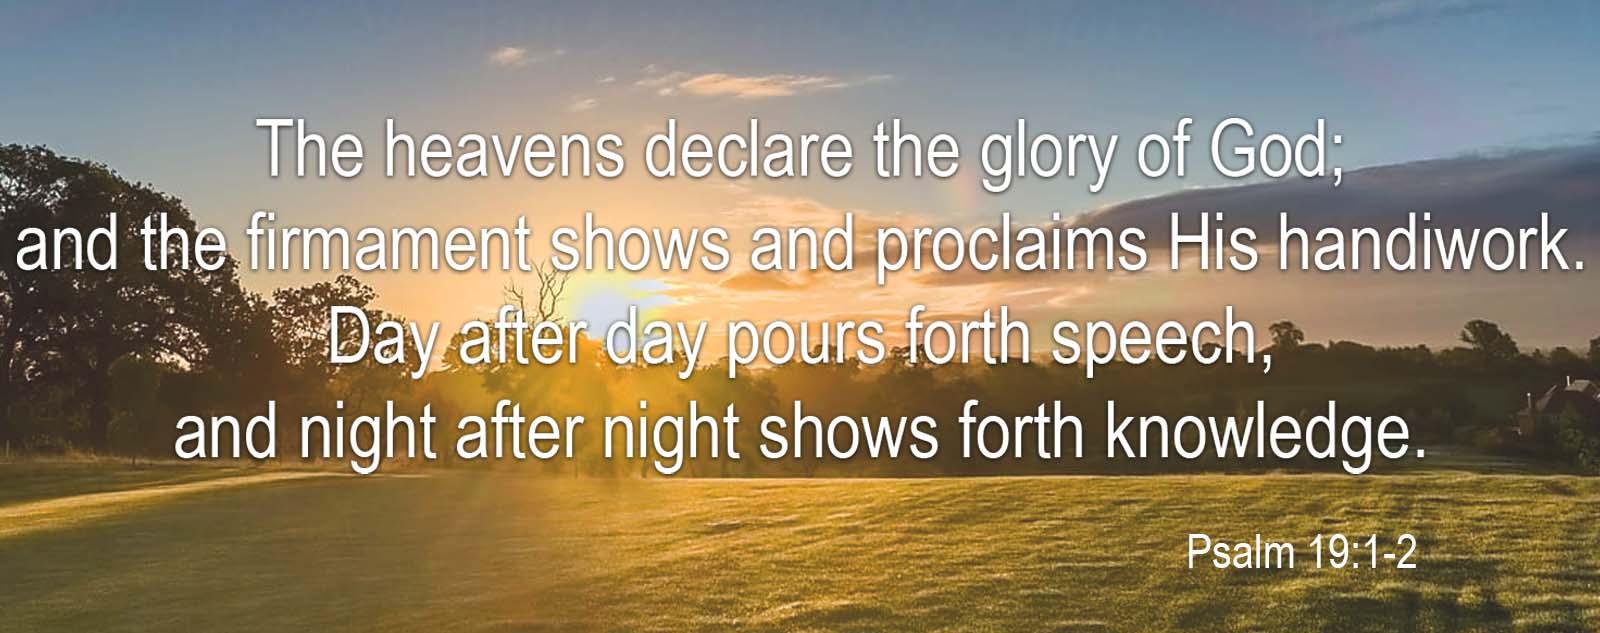 psalm 19 1 -2